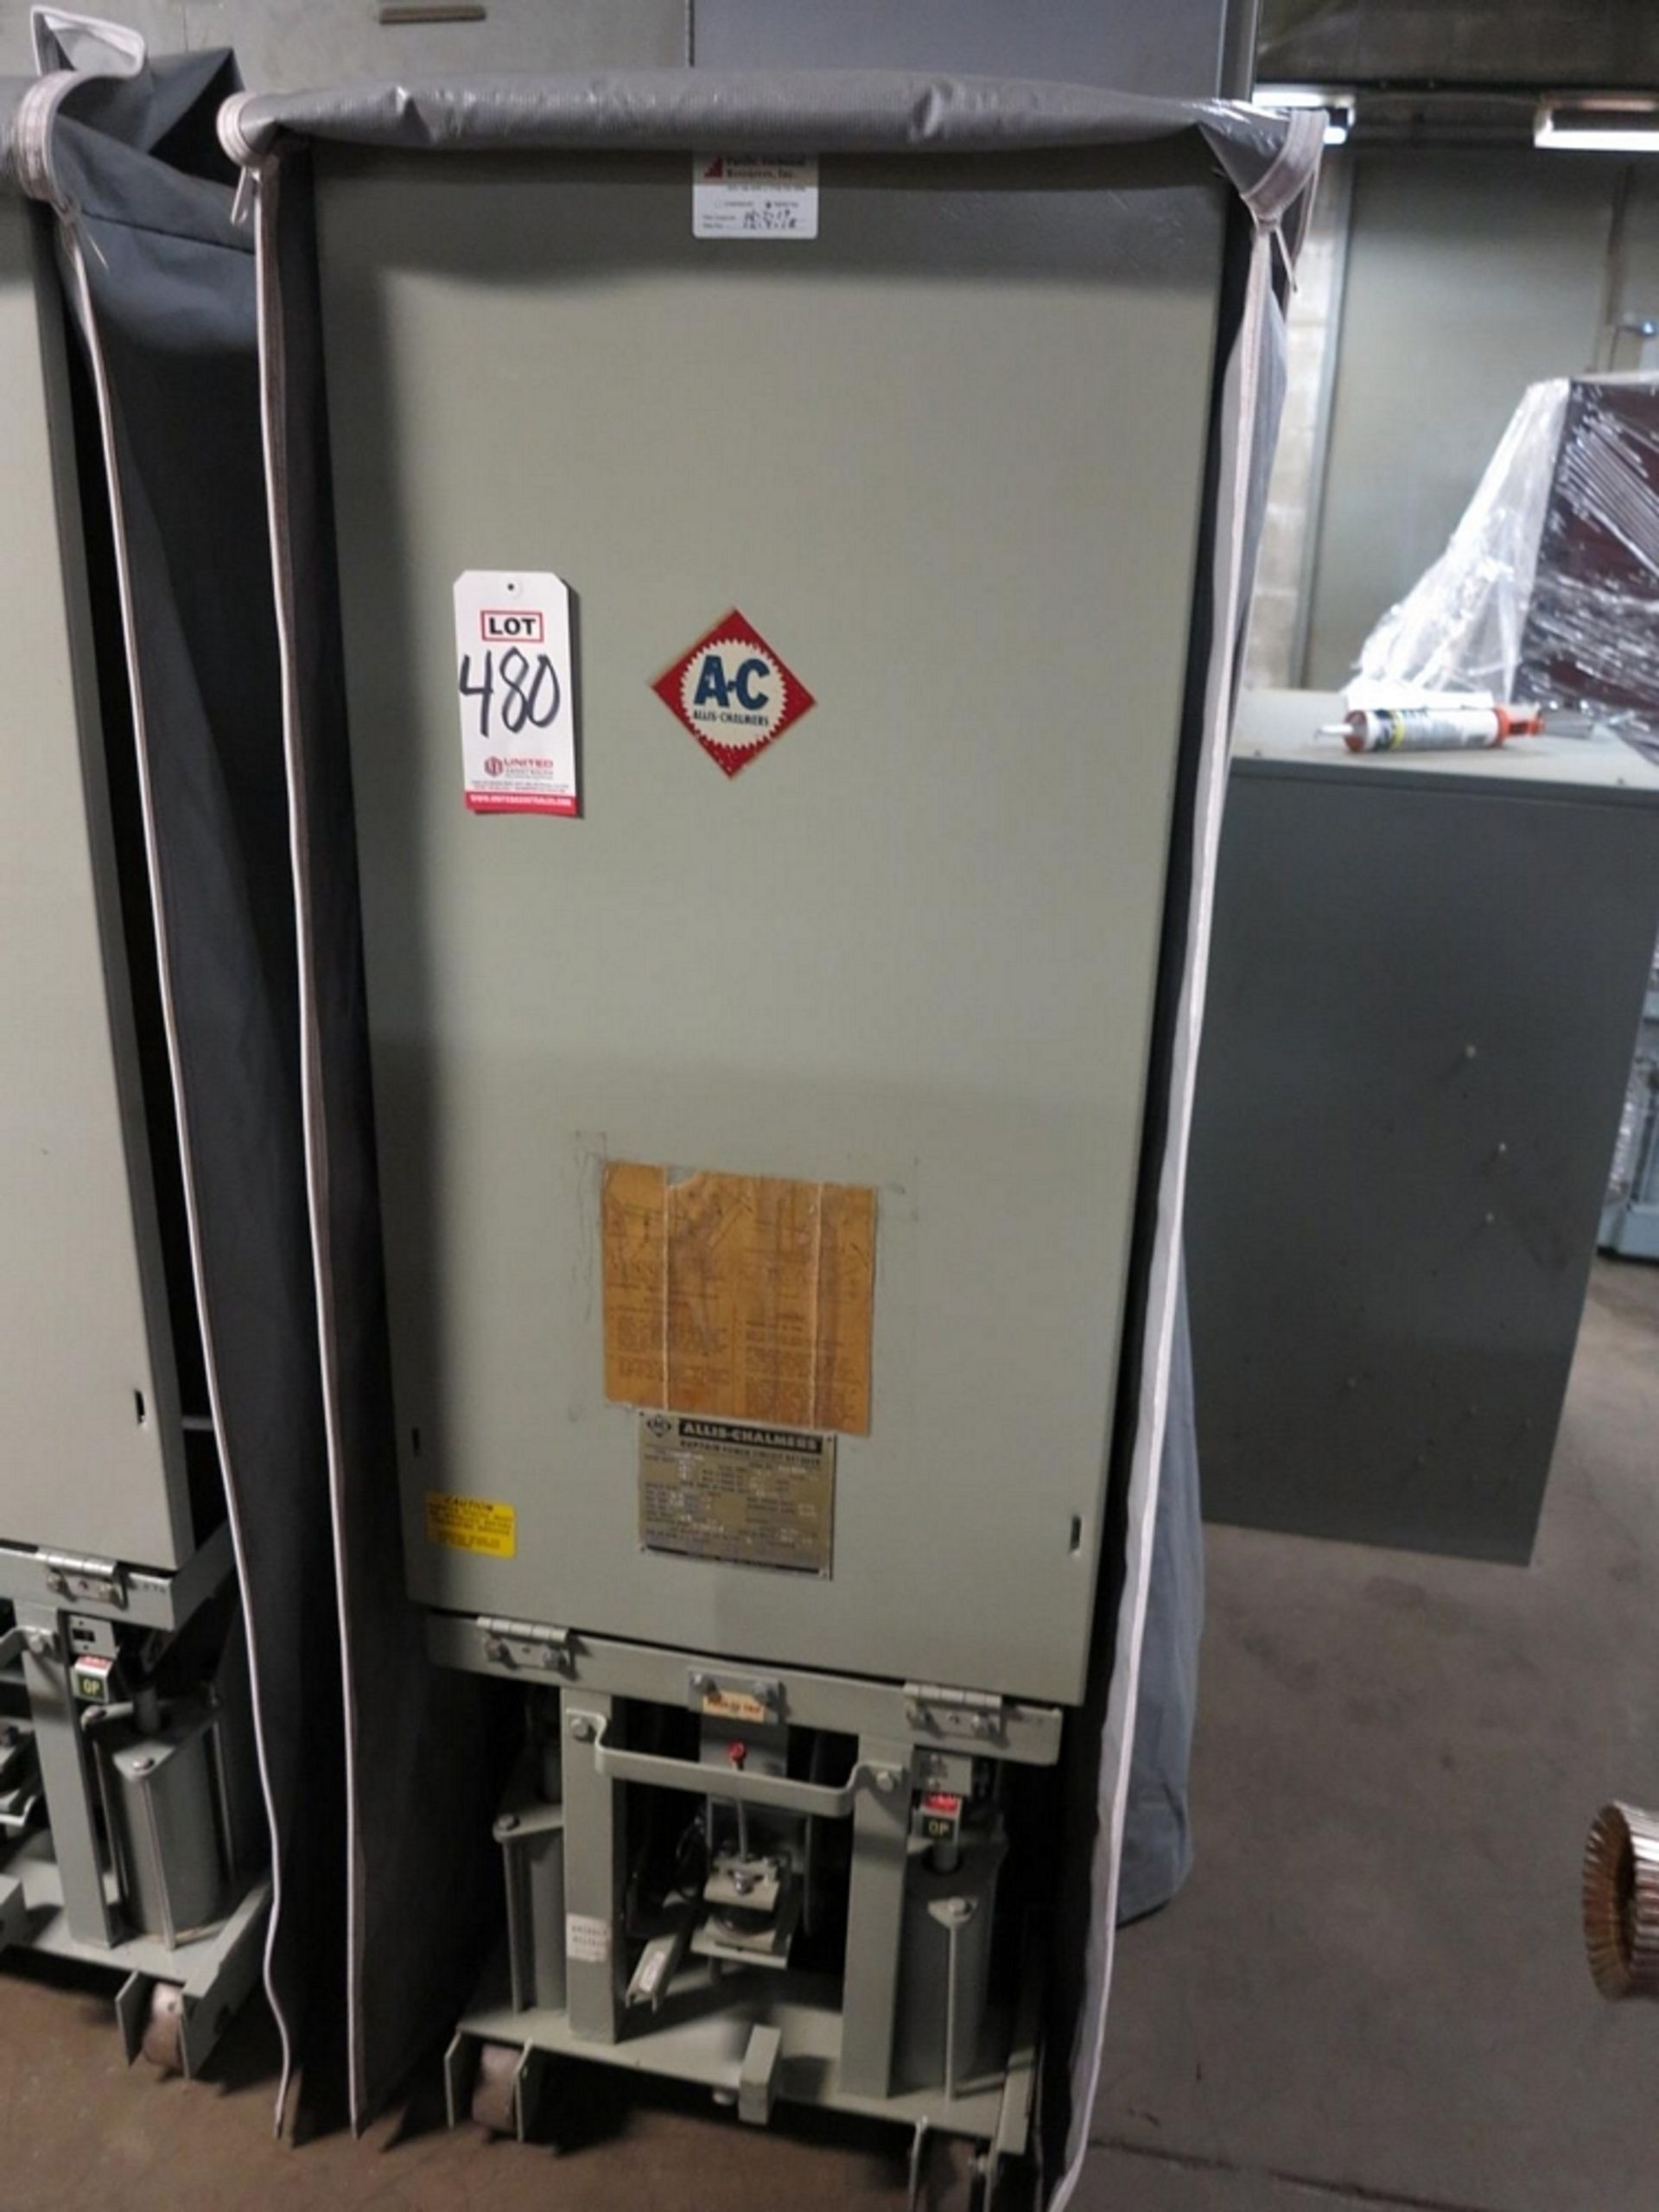 Lot 480 - ALLIS CHALMERS CIRCUIT BREAKER, TYPE MA-250A-1, 4160 V, 1200 A